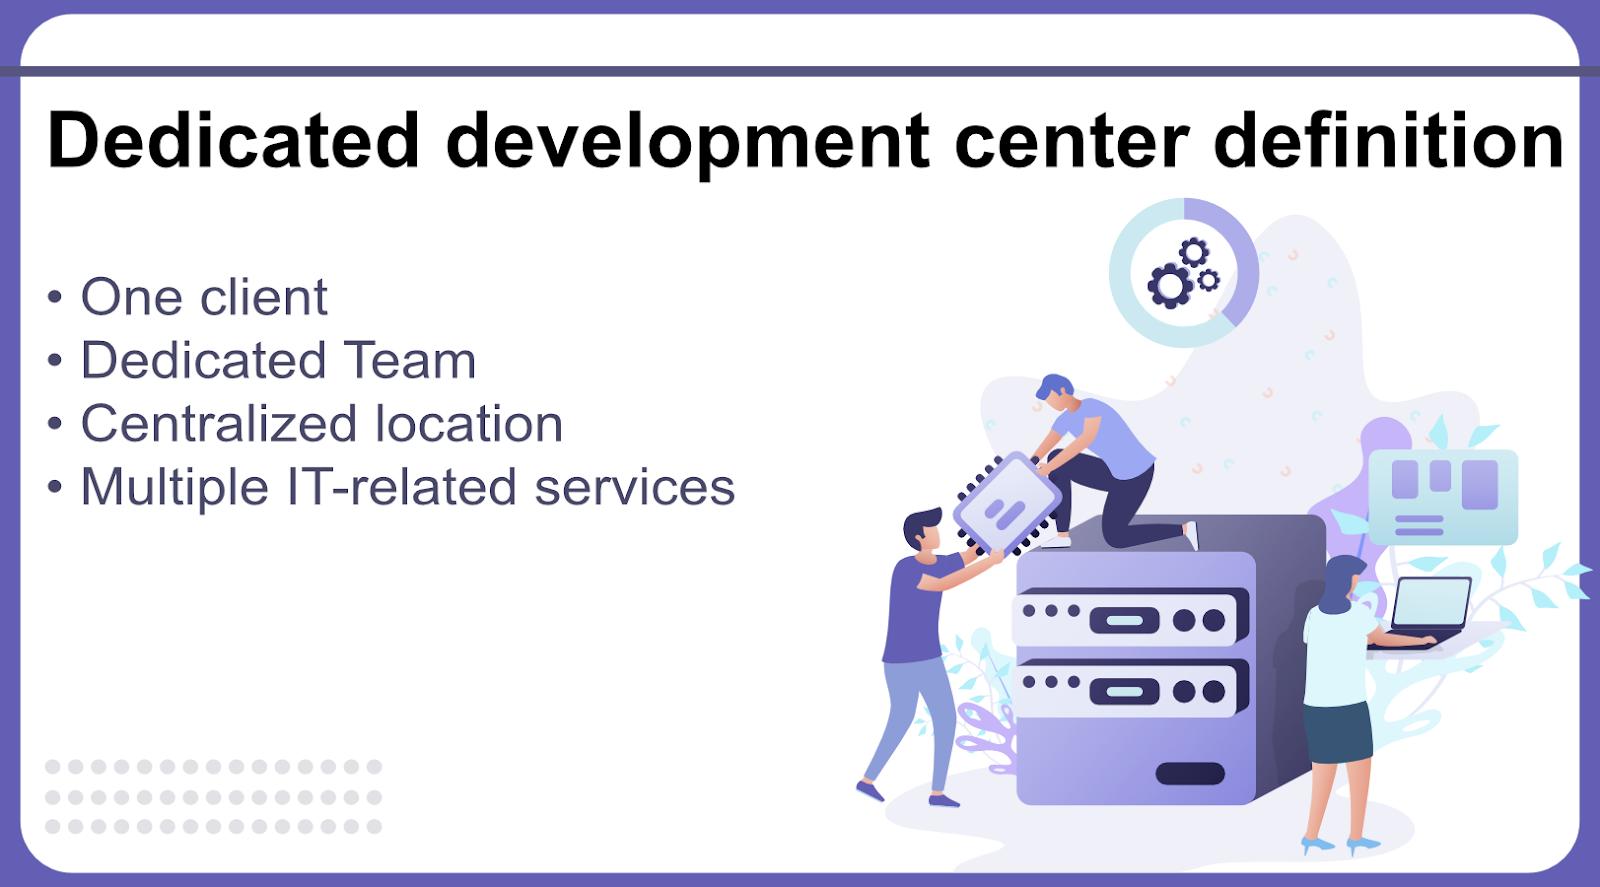 Dedicated development center definition